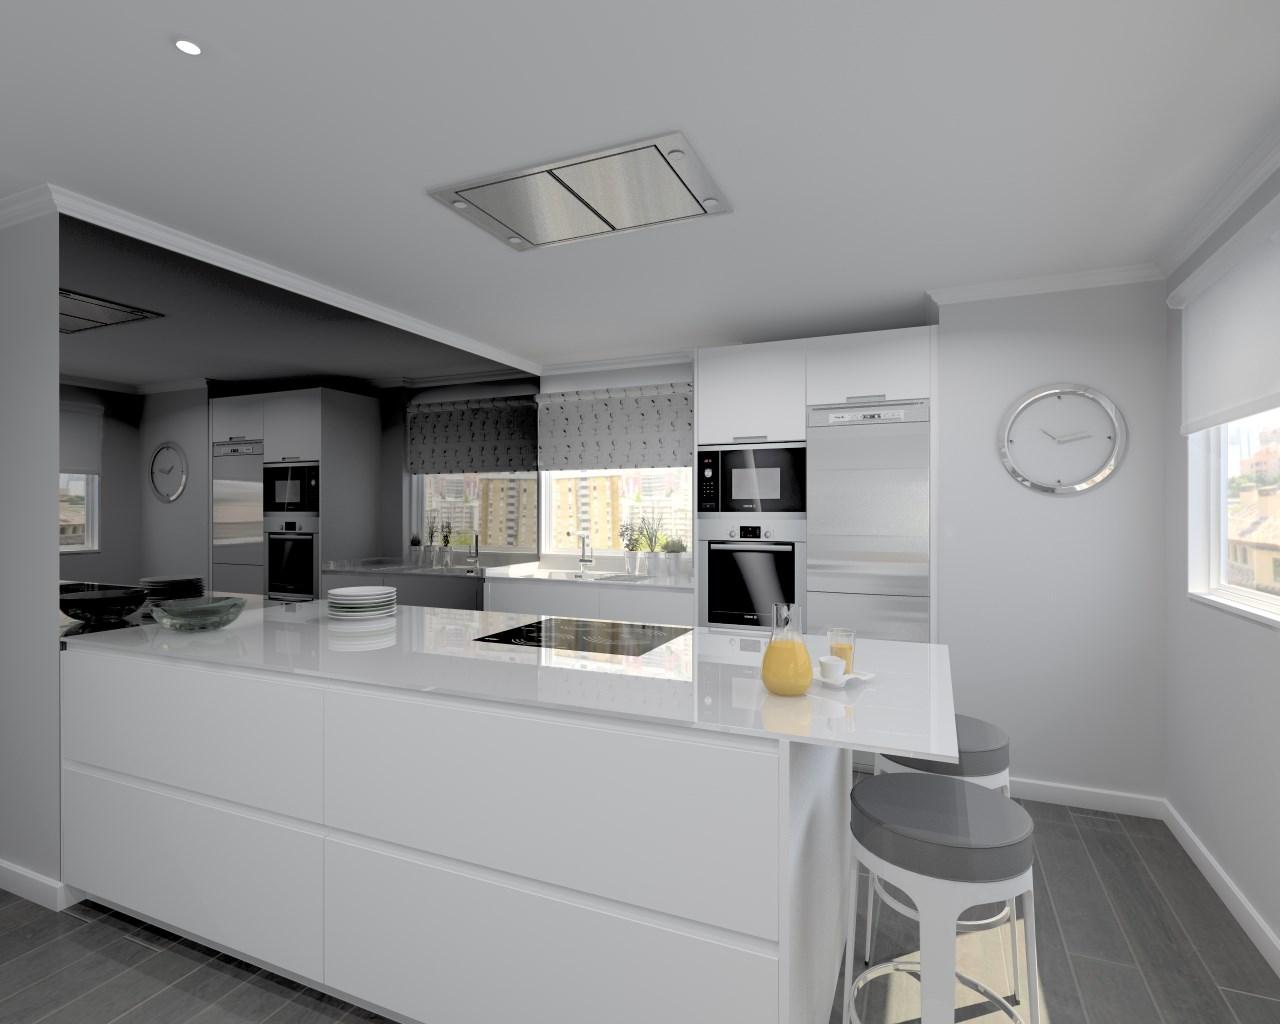 Cocina santos modelo line l blanco seda dalian estudio for Marmol de carrara para cocinas